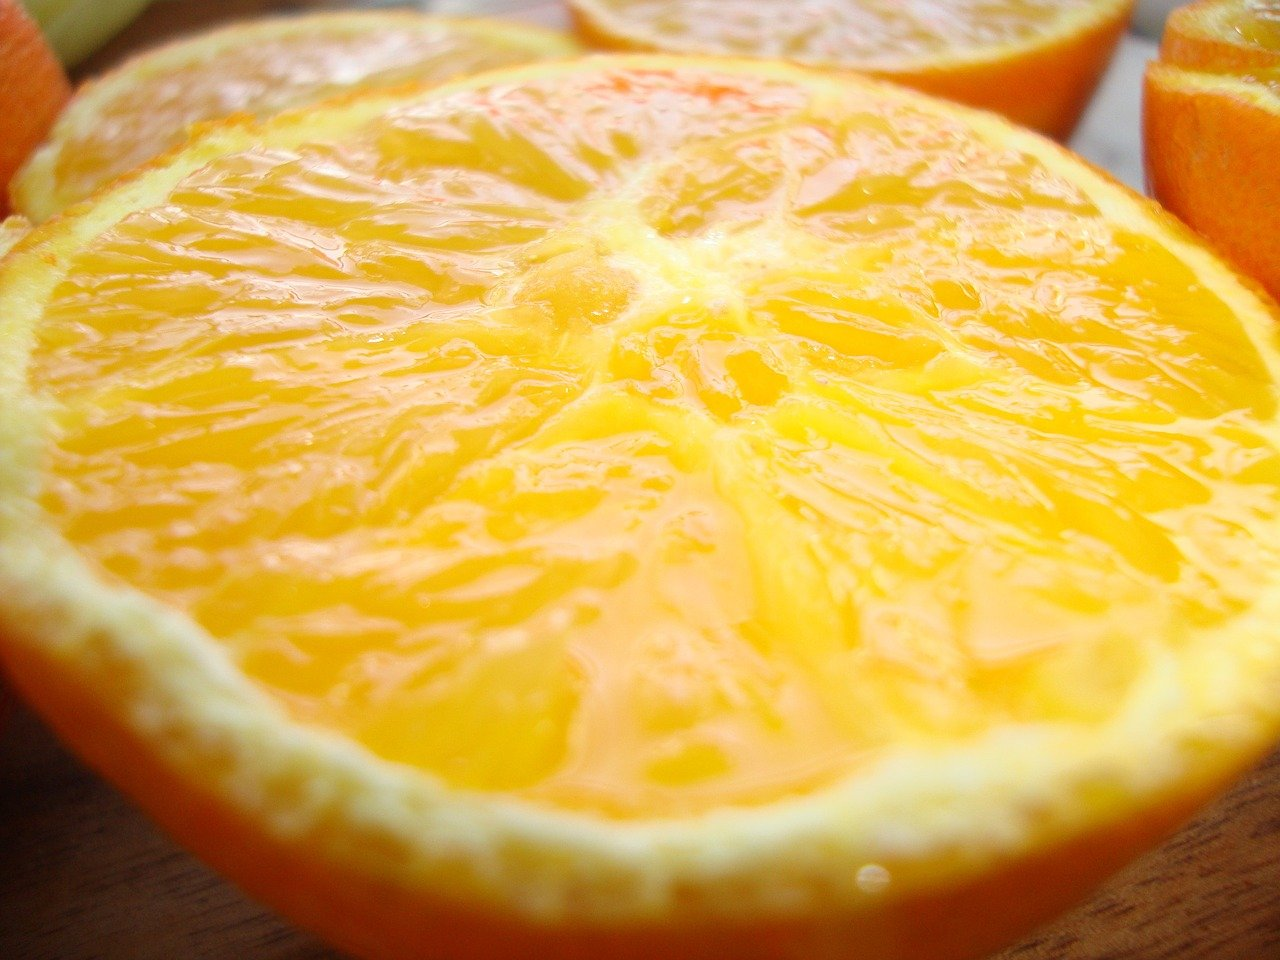 La dieta de la naranja funciona